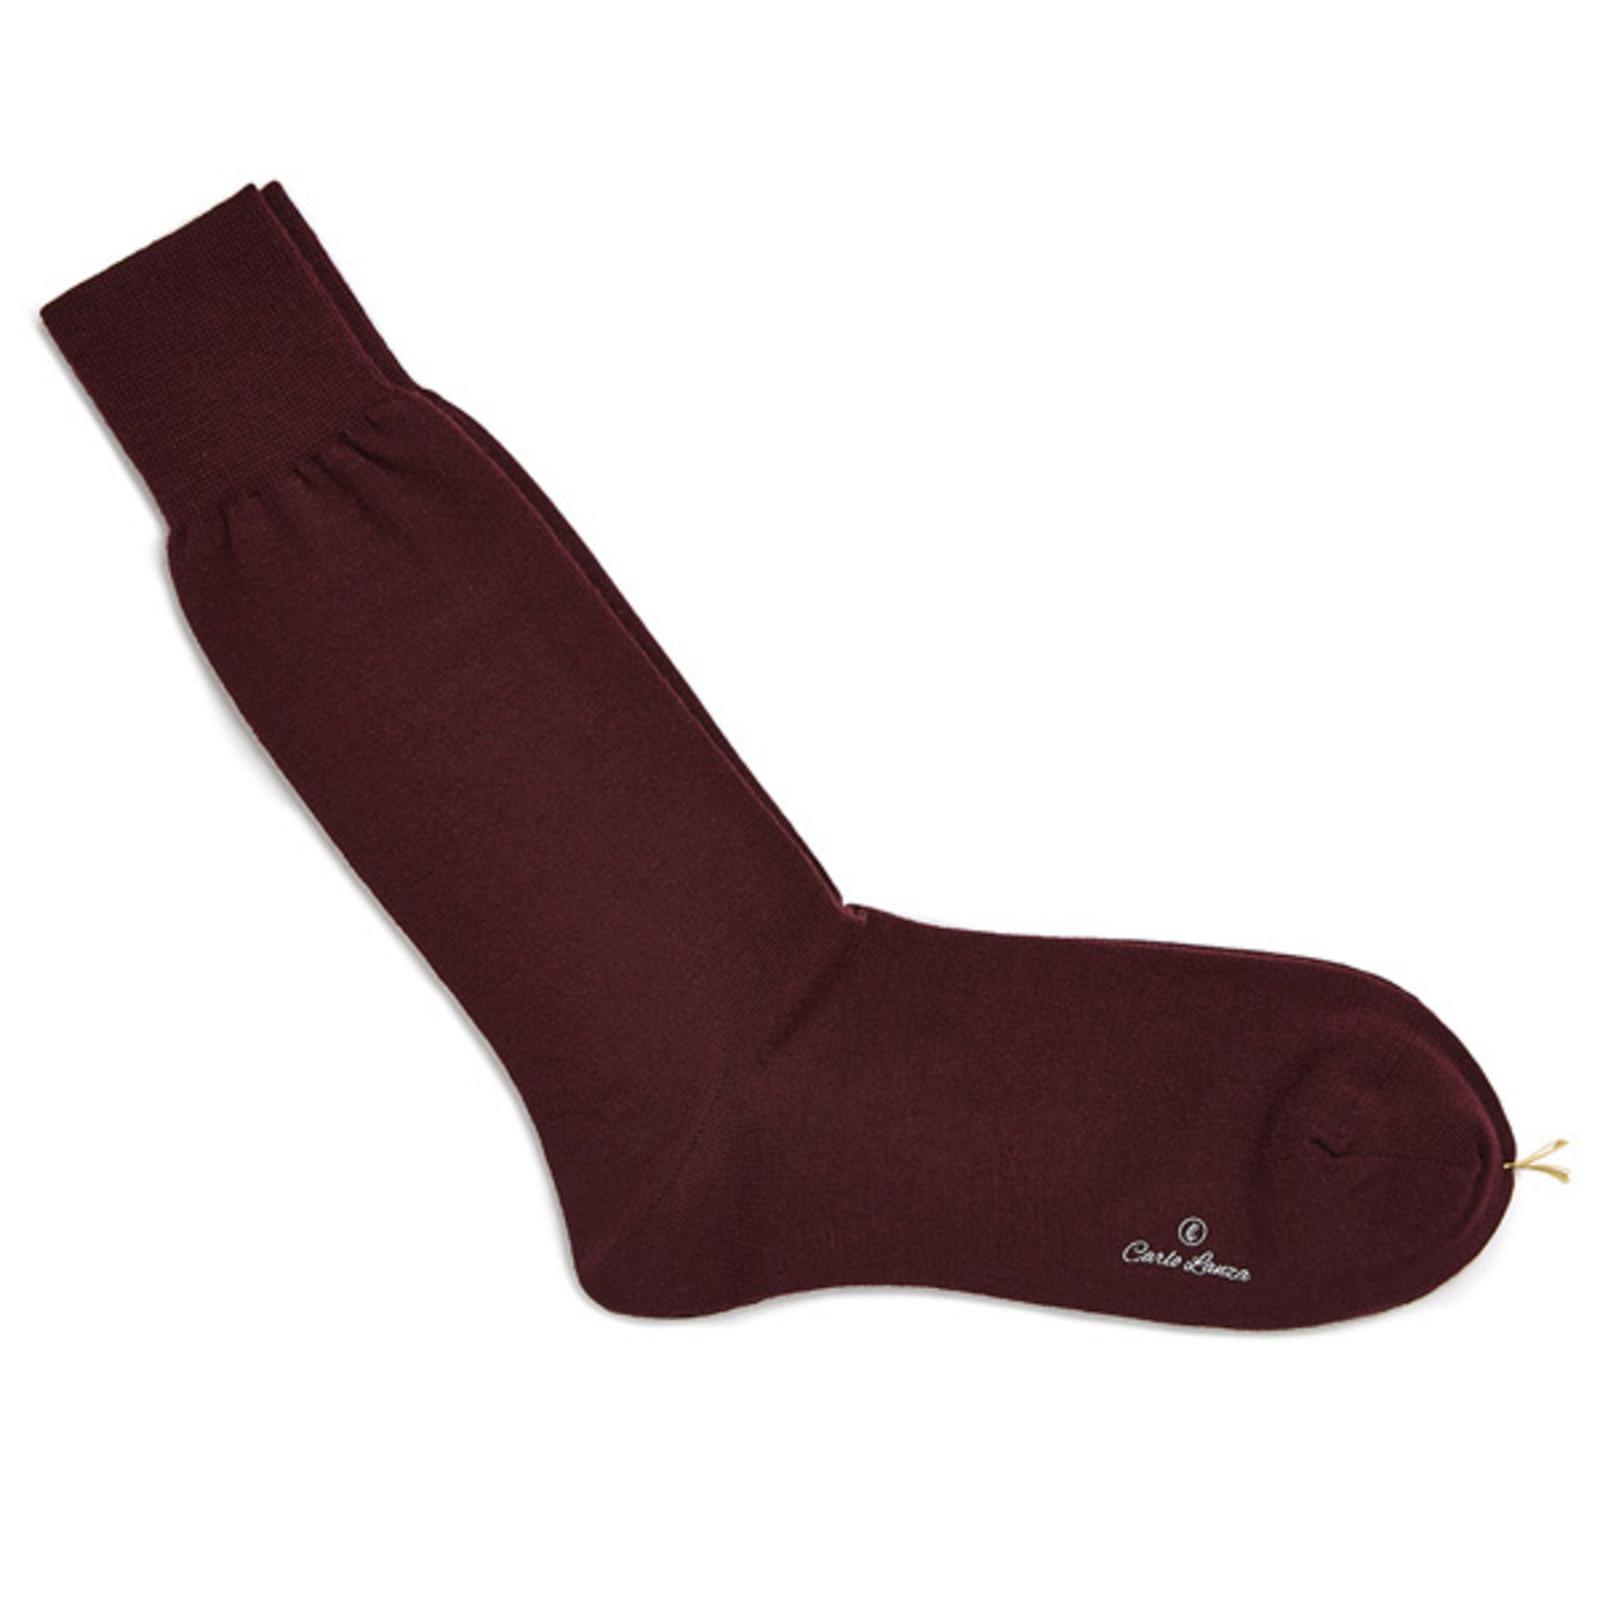 Carlo Lanza Bordeauxroten Merino Wolle Socken